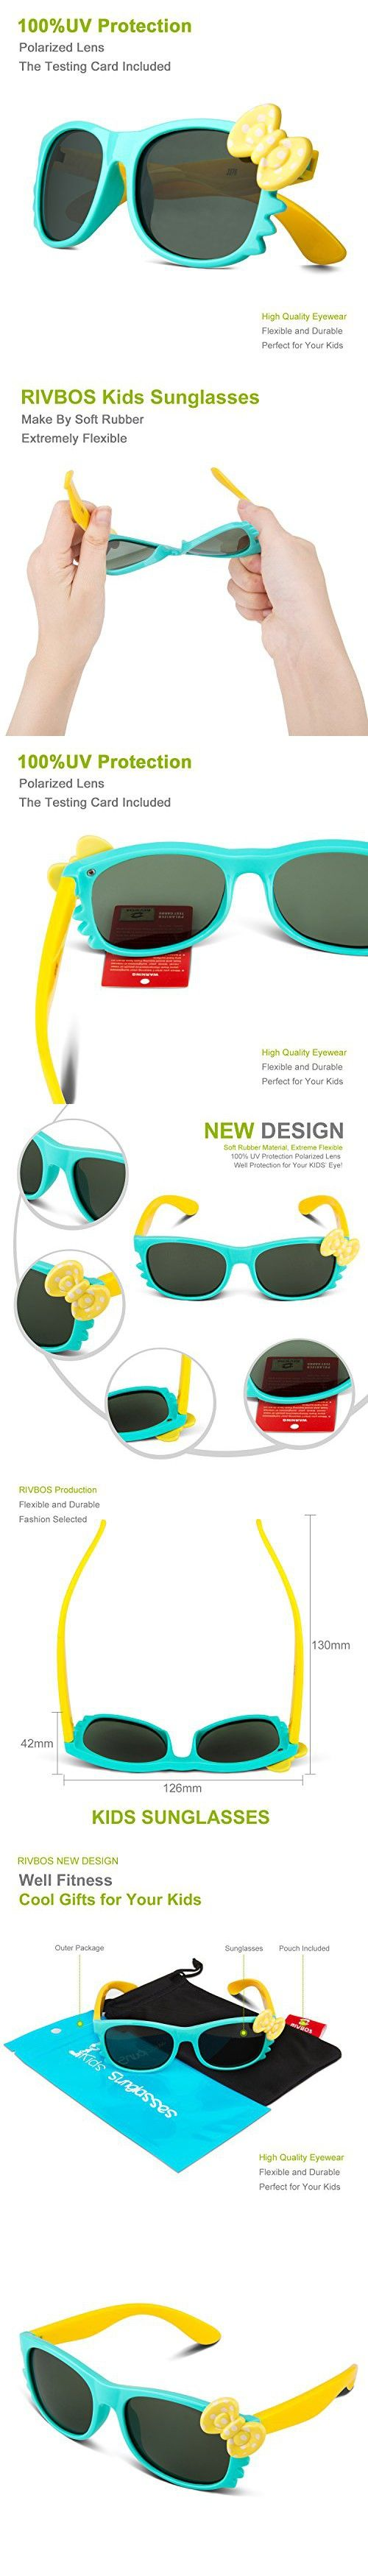 e6eaeefeaa6 RIVBOS RBK002 Rubber Flexible Kids Polarized Sunglasses Age 3-10 (Blue)